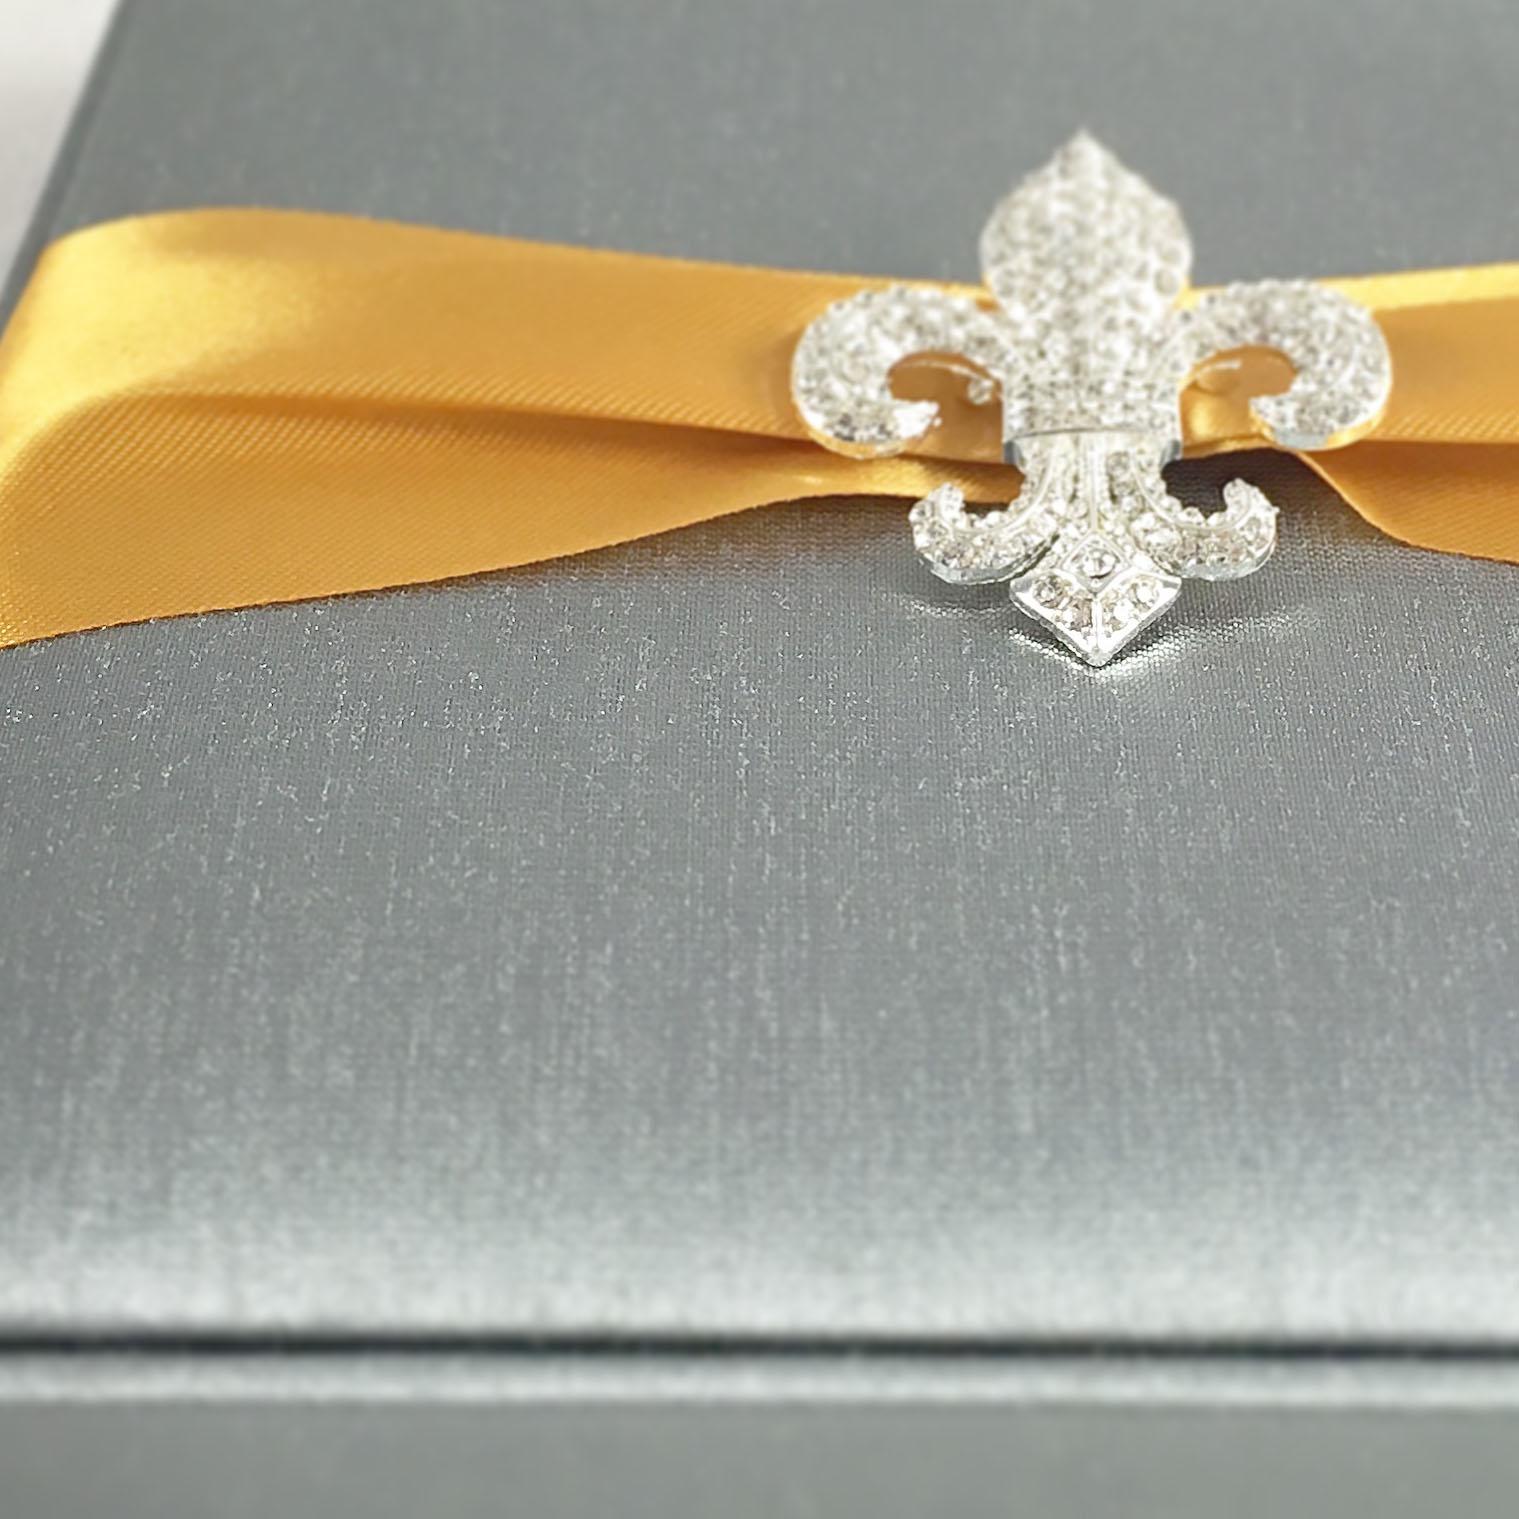 Fleur De Lis Wedding Invitation Creation With Charcoal Color Silk ...